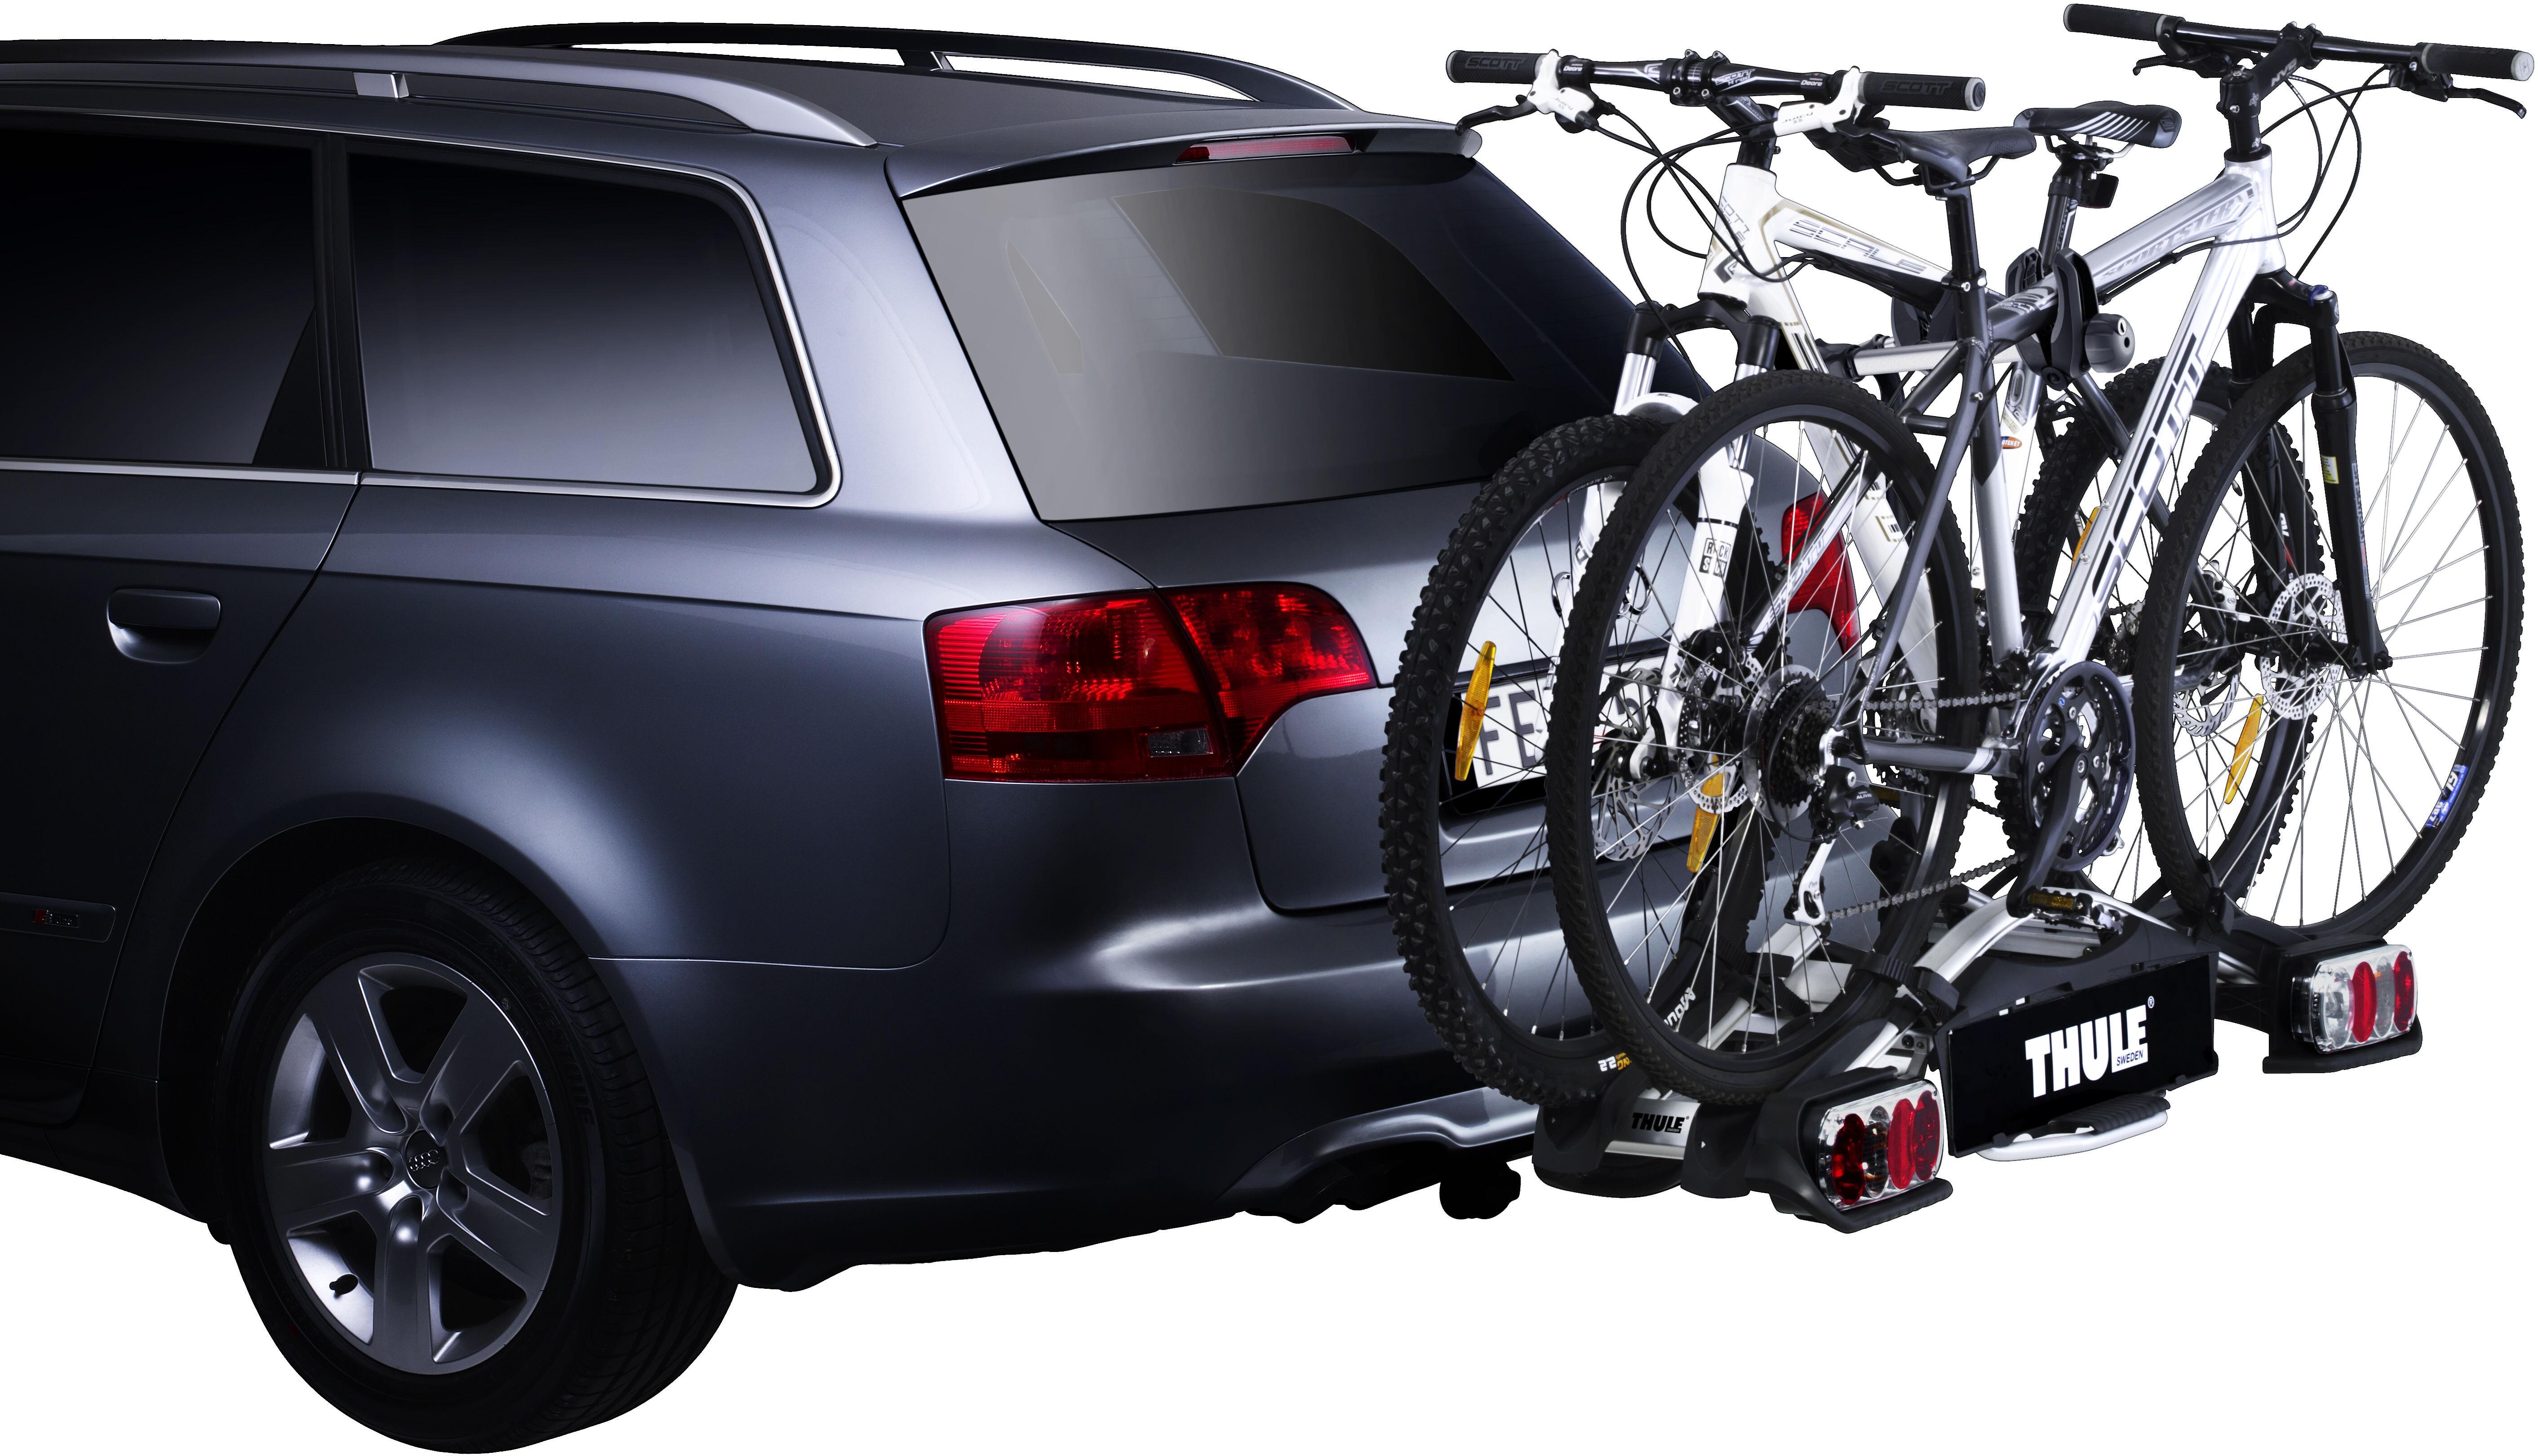 thule 935 carrier 2 bike black edition online kaufen bei. Black Bedroom Furniture Sets. Home Design Ideas